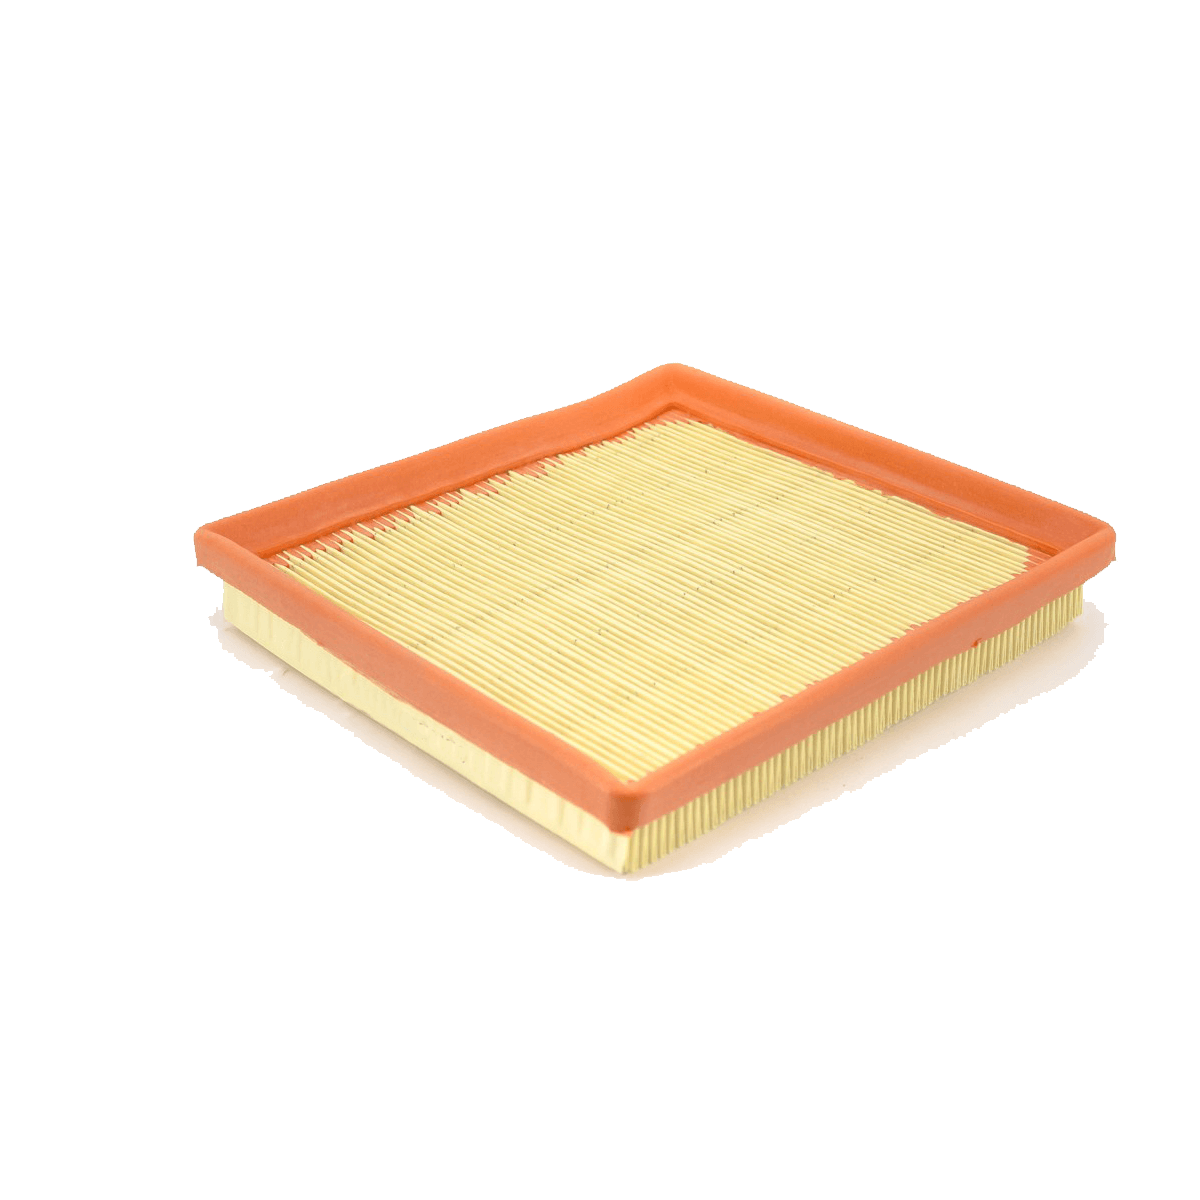 Filtro de Ar Fox MSI 1.6 Wega FAP 2219 / Tecfil ARL6080 em até 6x sem juros